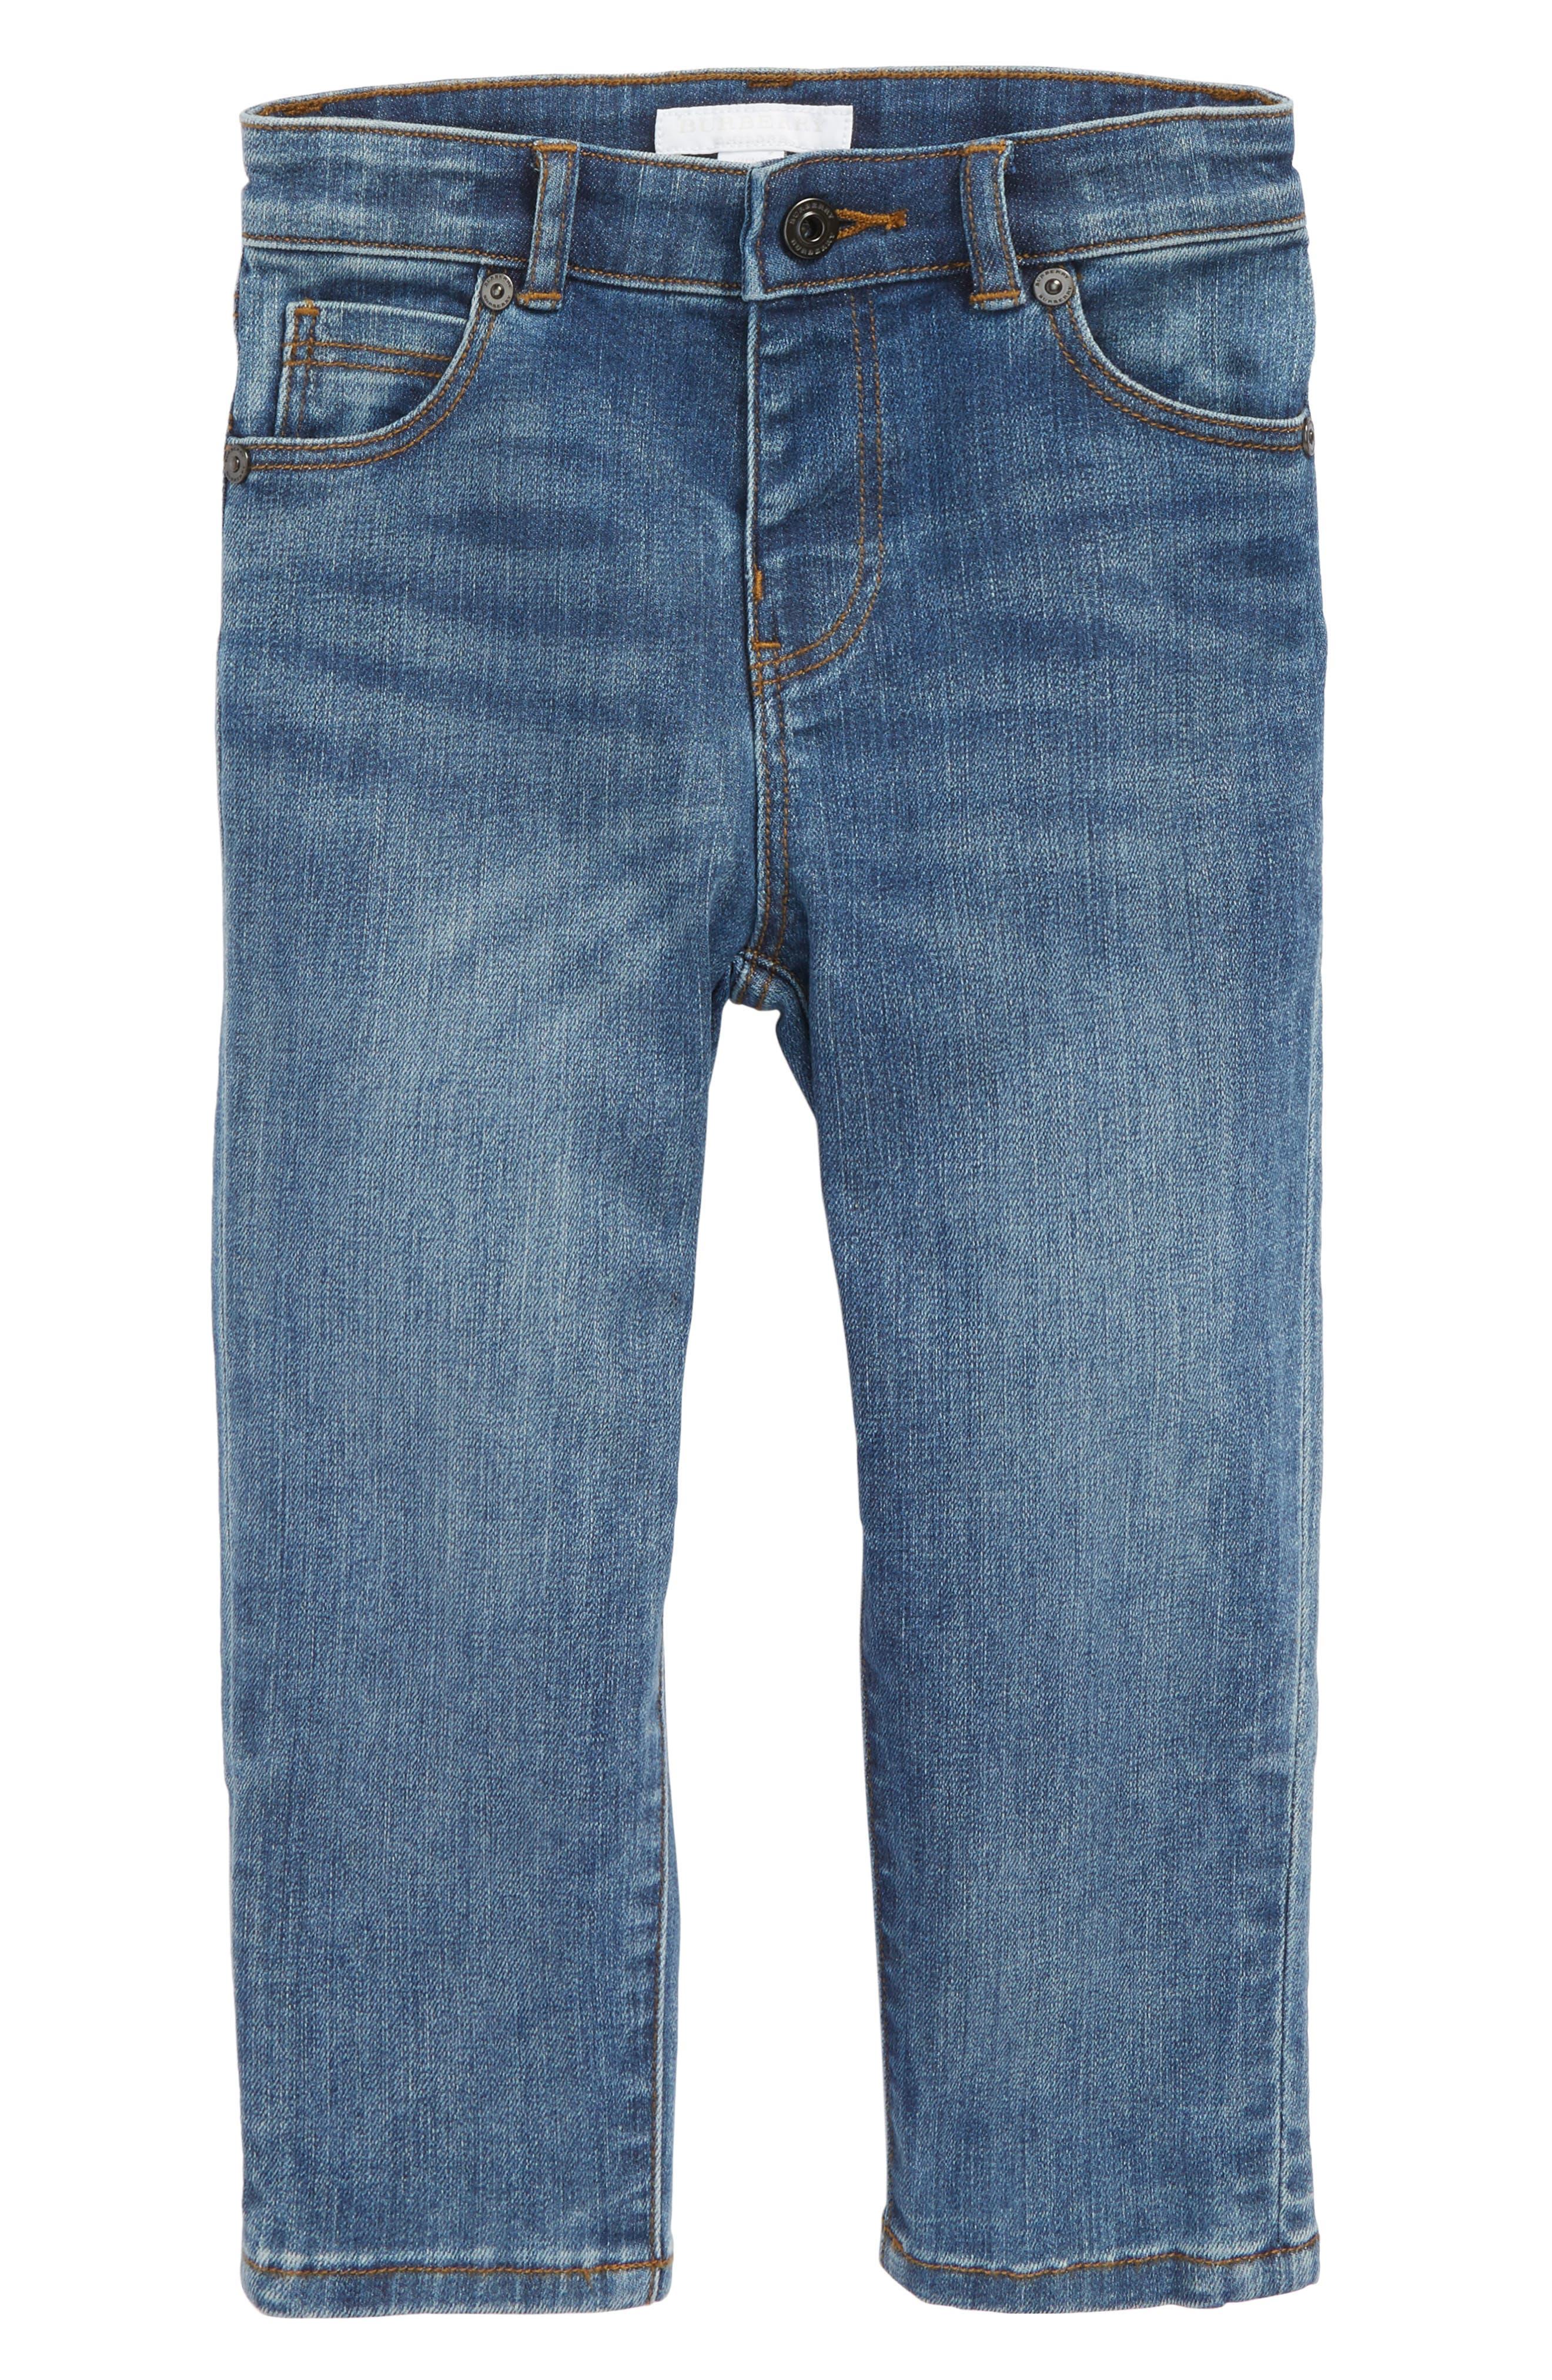 Skinny Jeans,                             Main thumbnail 1, color,                             412